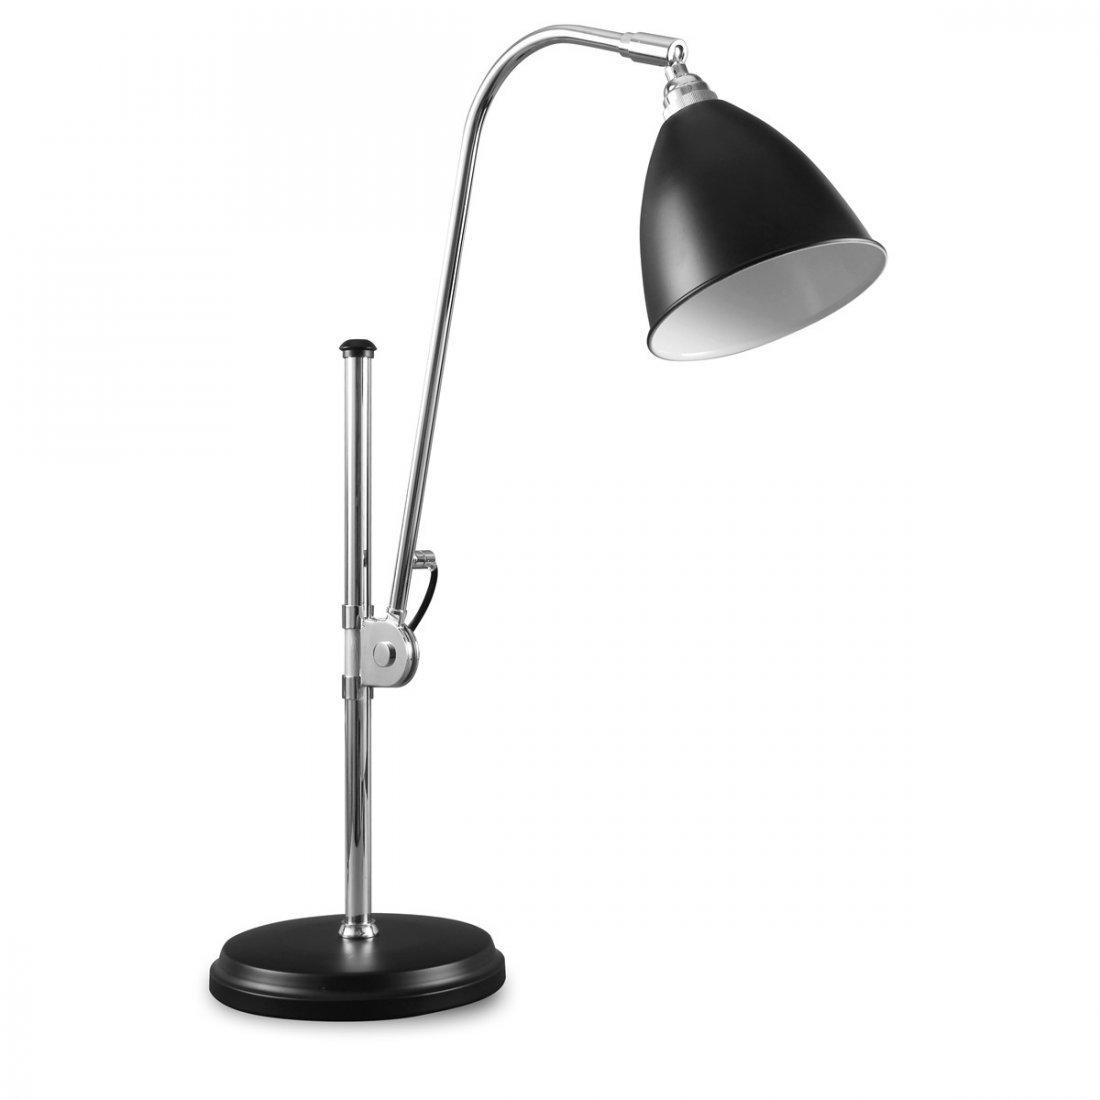 Bestlite BL1 Table Lamp by Robert Dudley Best